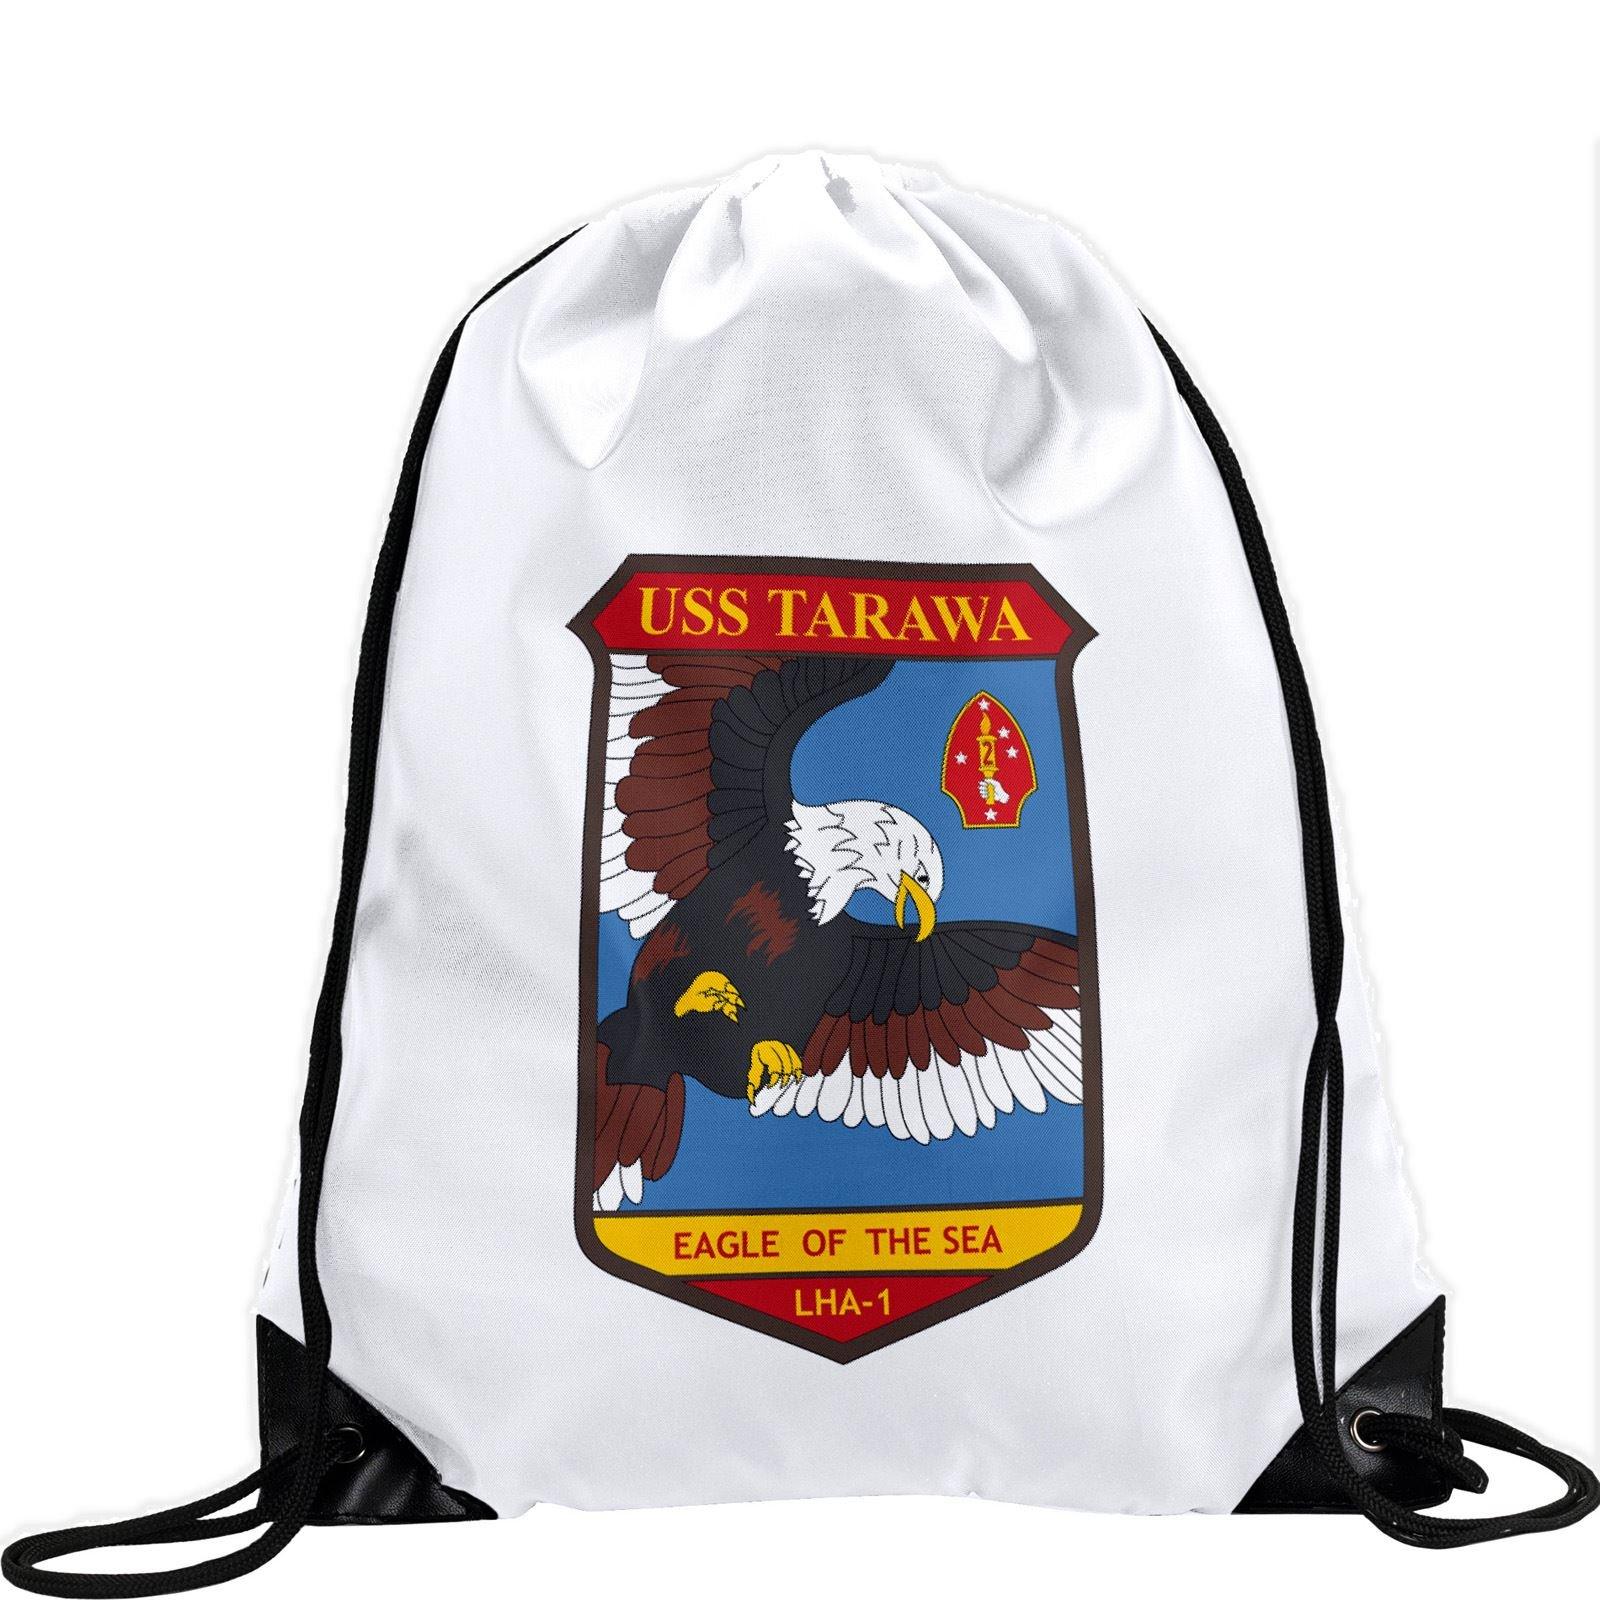 Large Drawstring Bag with US Navy USS Tarawa (LHA-1, Eagle of the Sea) (decom) - Long lasting vibrant image